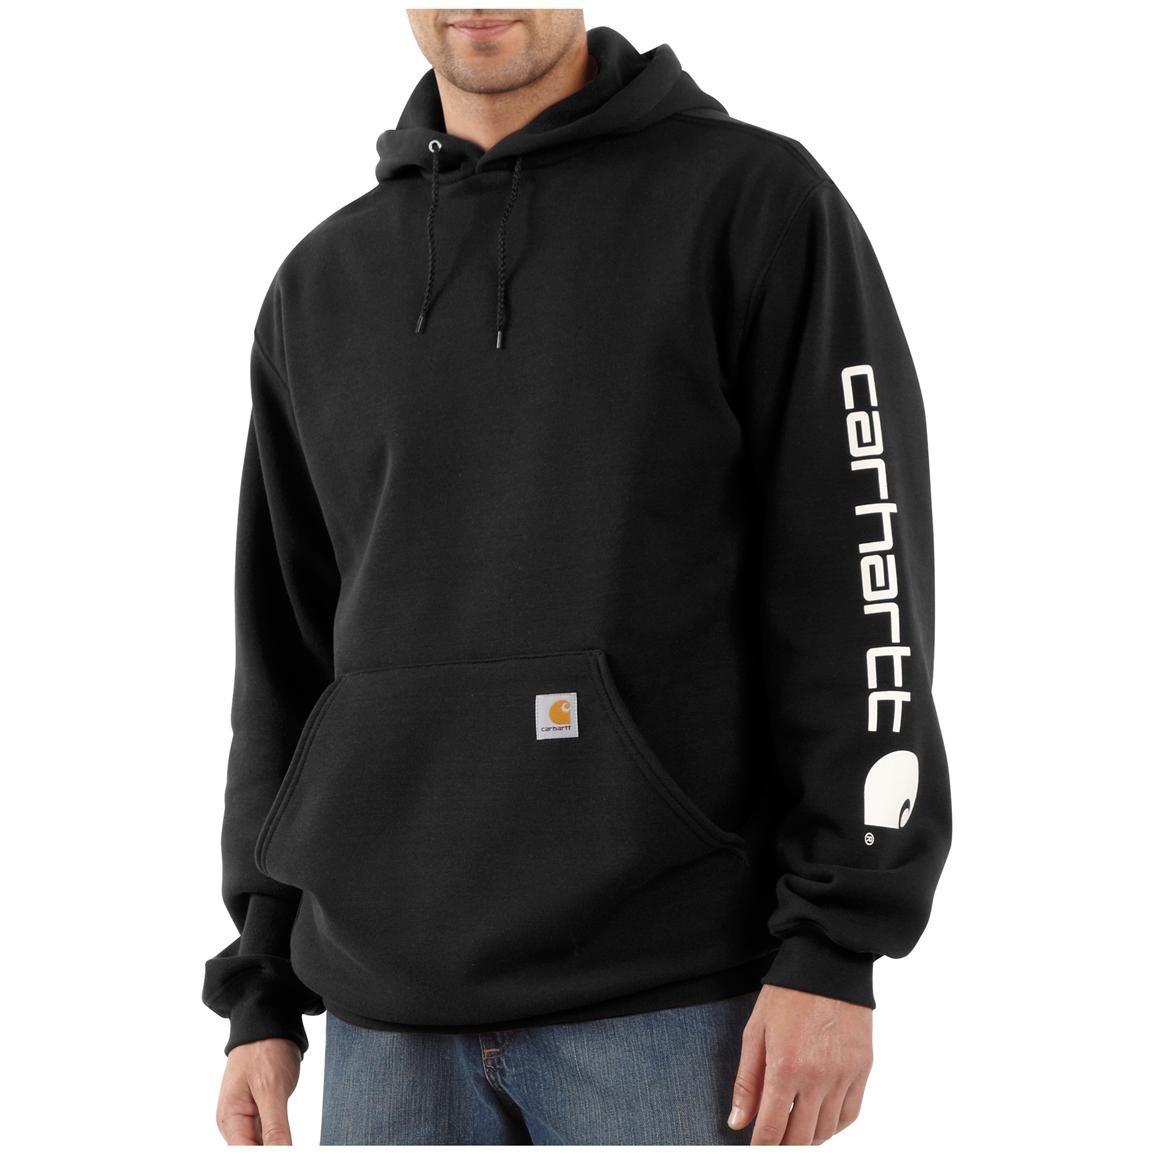 Carhartt Hoodie With Sleeve Logo Cold Weather Comfort On And Off The Clock Carhartt Hoodie Carhartt Sweatshirts Sweatshirts [ 1154 x 1154 Pixel ]